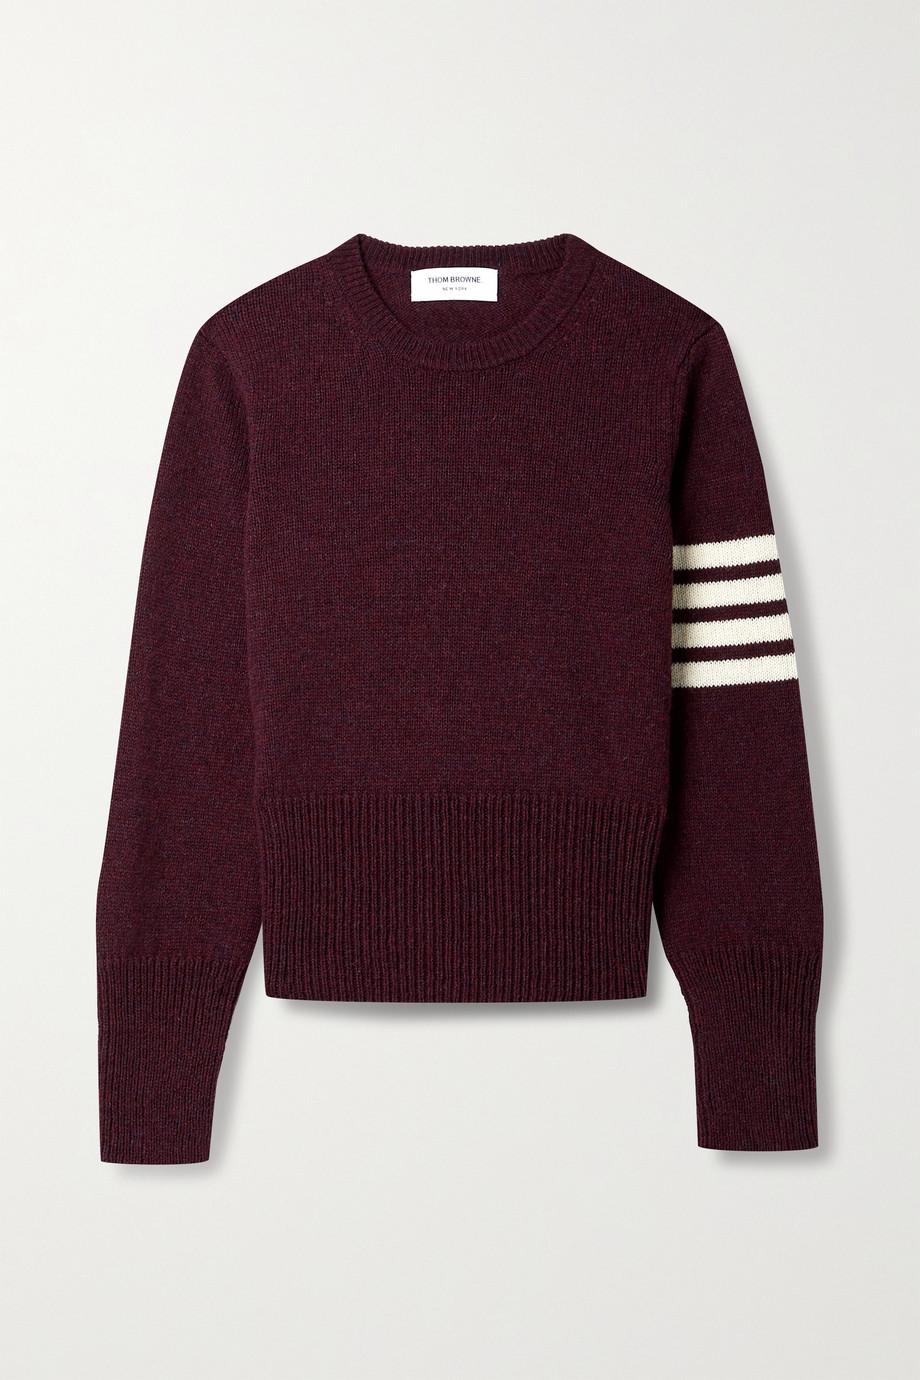 Thom Browne Striped wool sweater